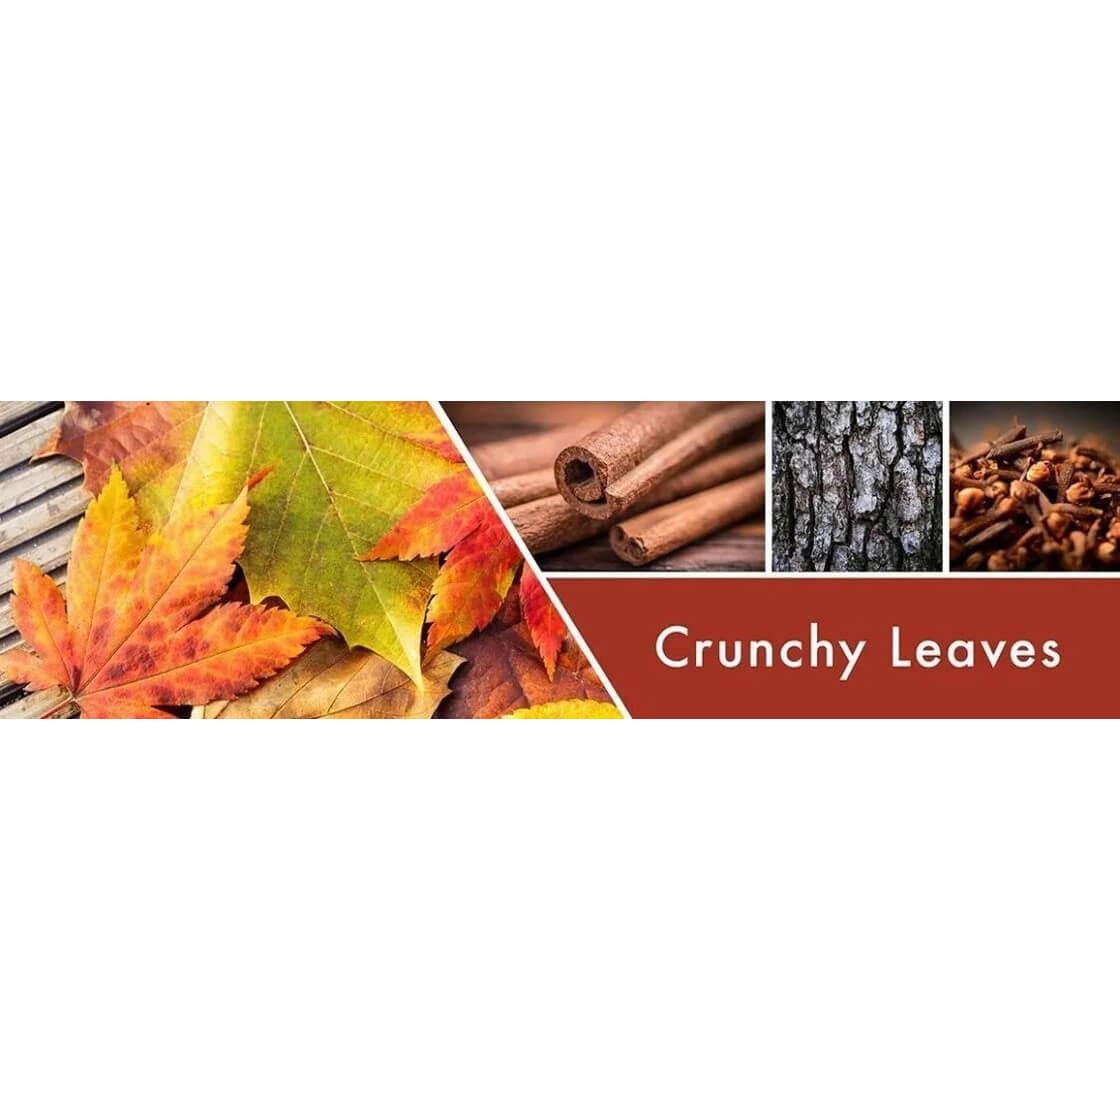 goose-creek-candlez-crunchy-leaves-2-docht-kerze-680g-2DwnfA9NQIB8C1